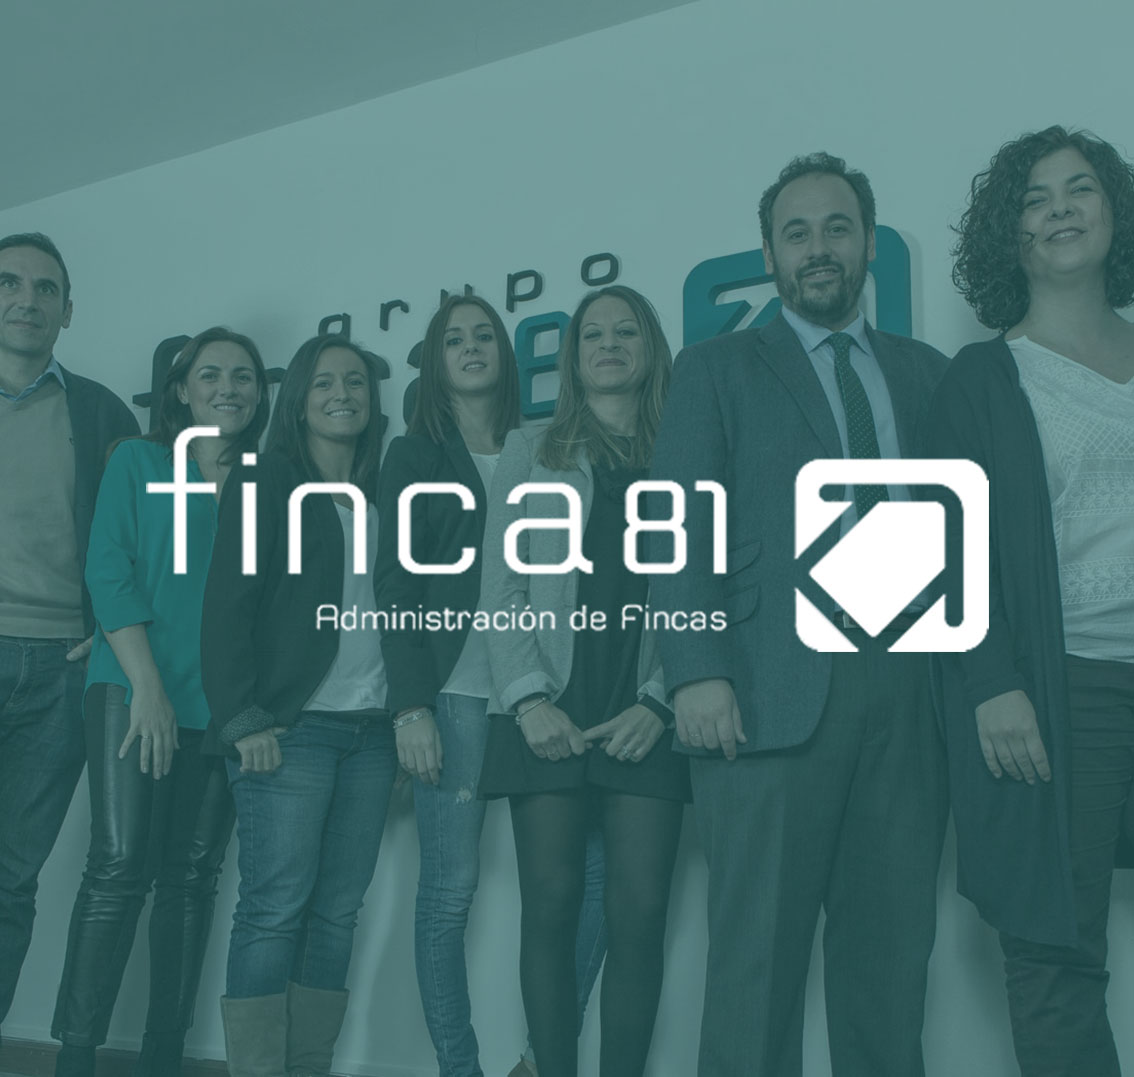 finca81